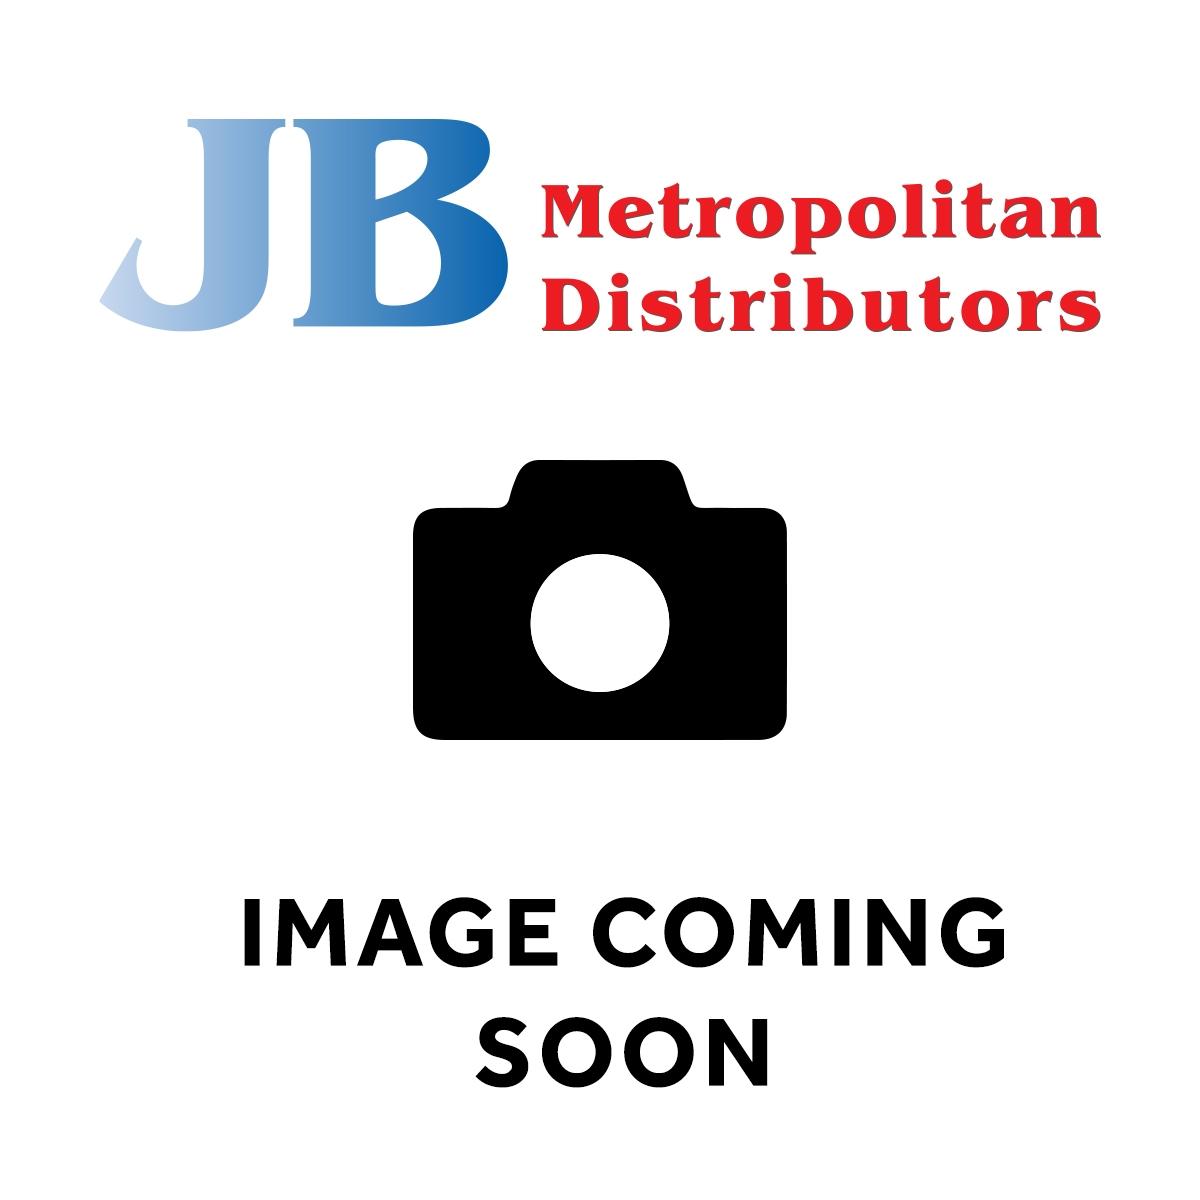 POP ROCKS COLA